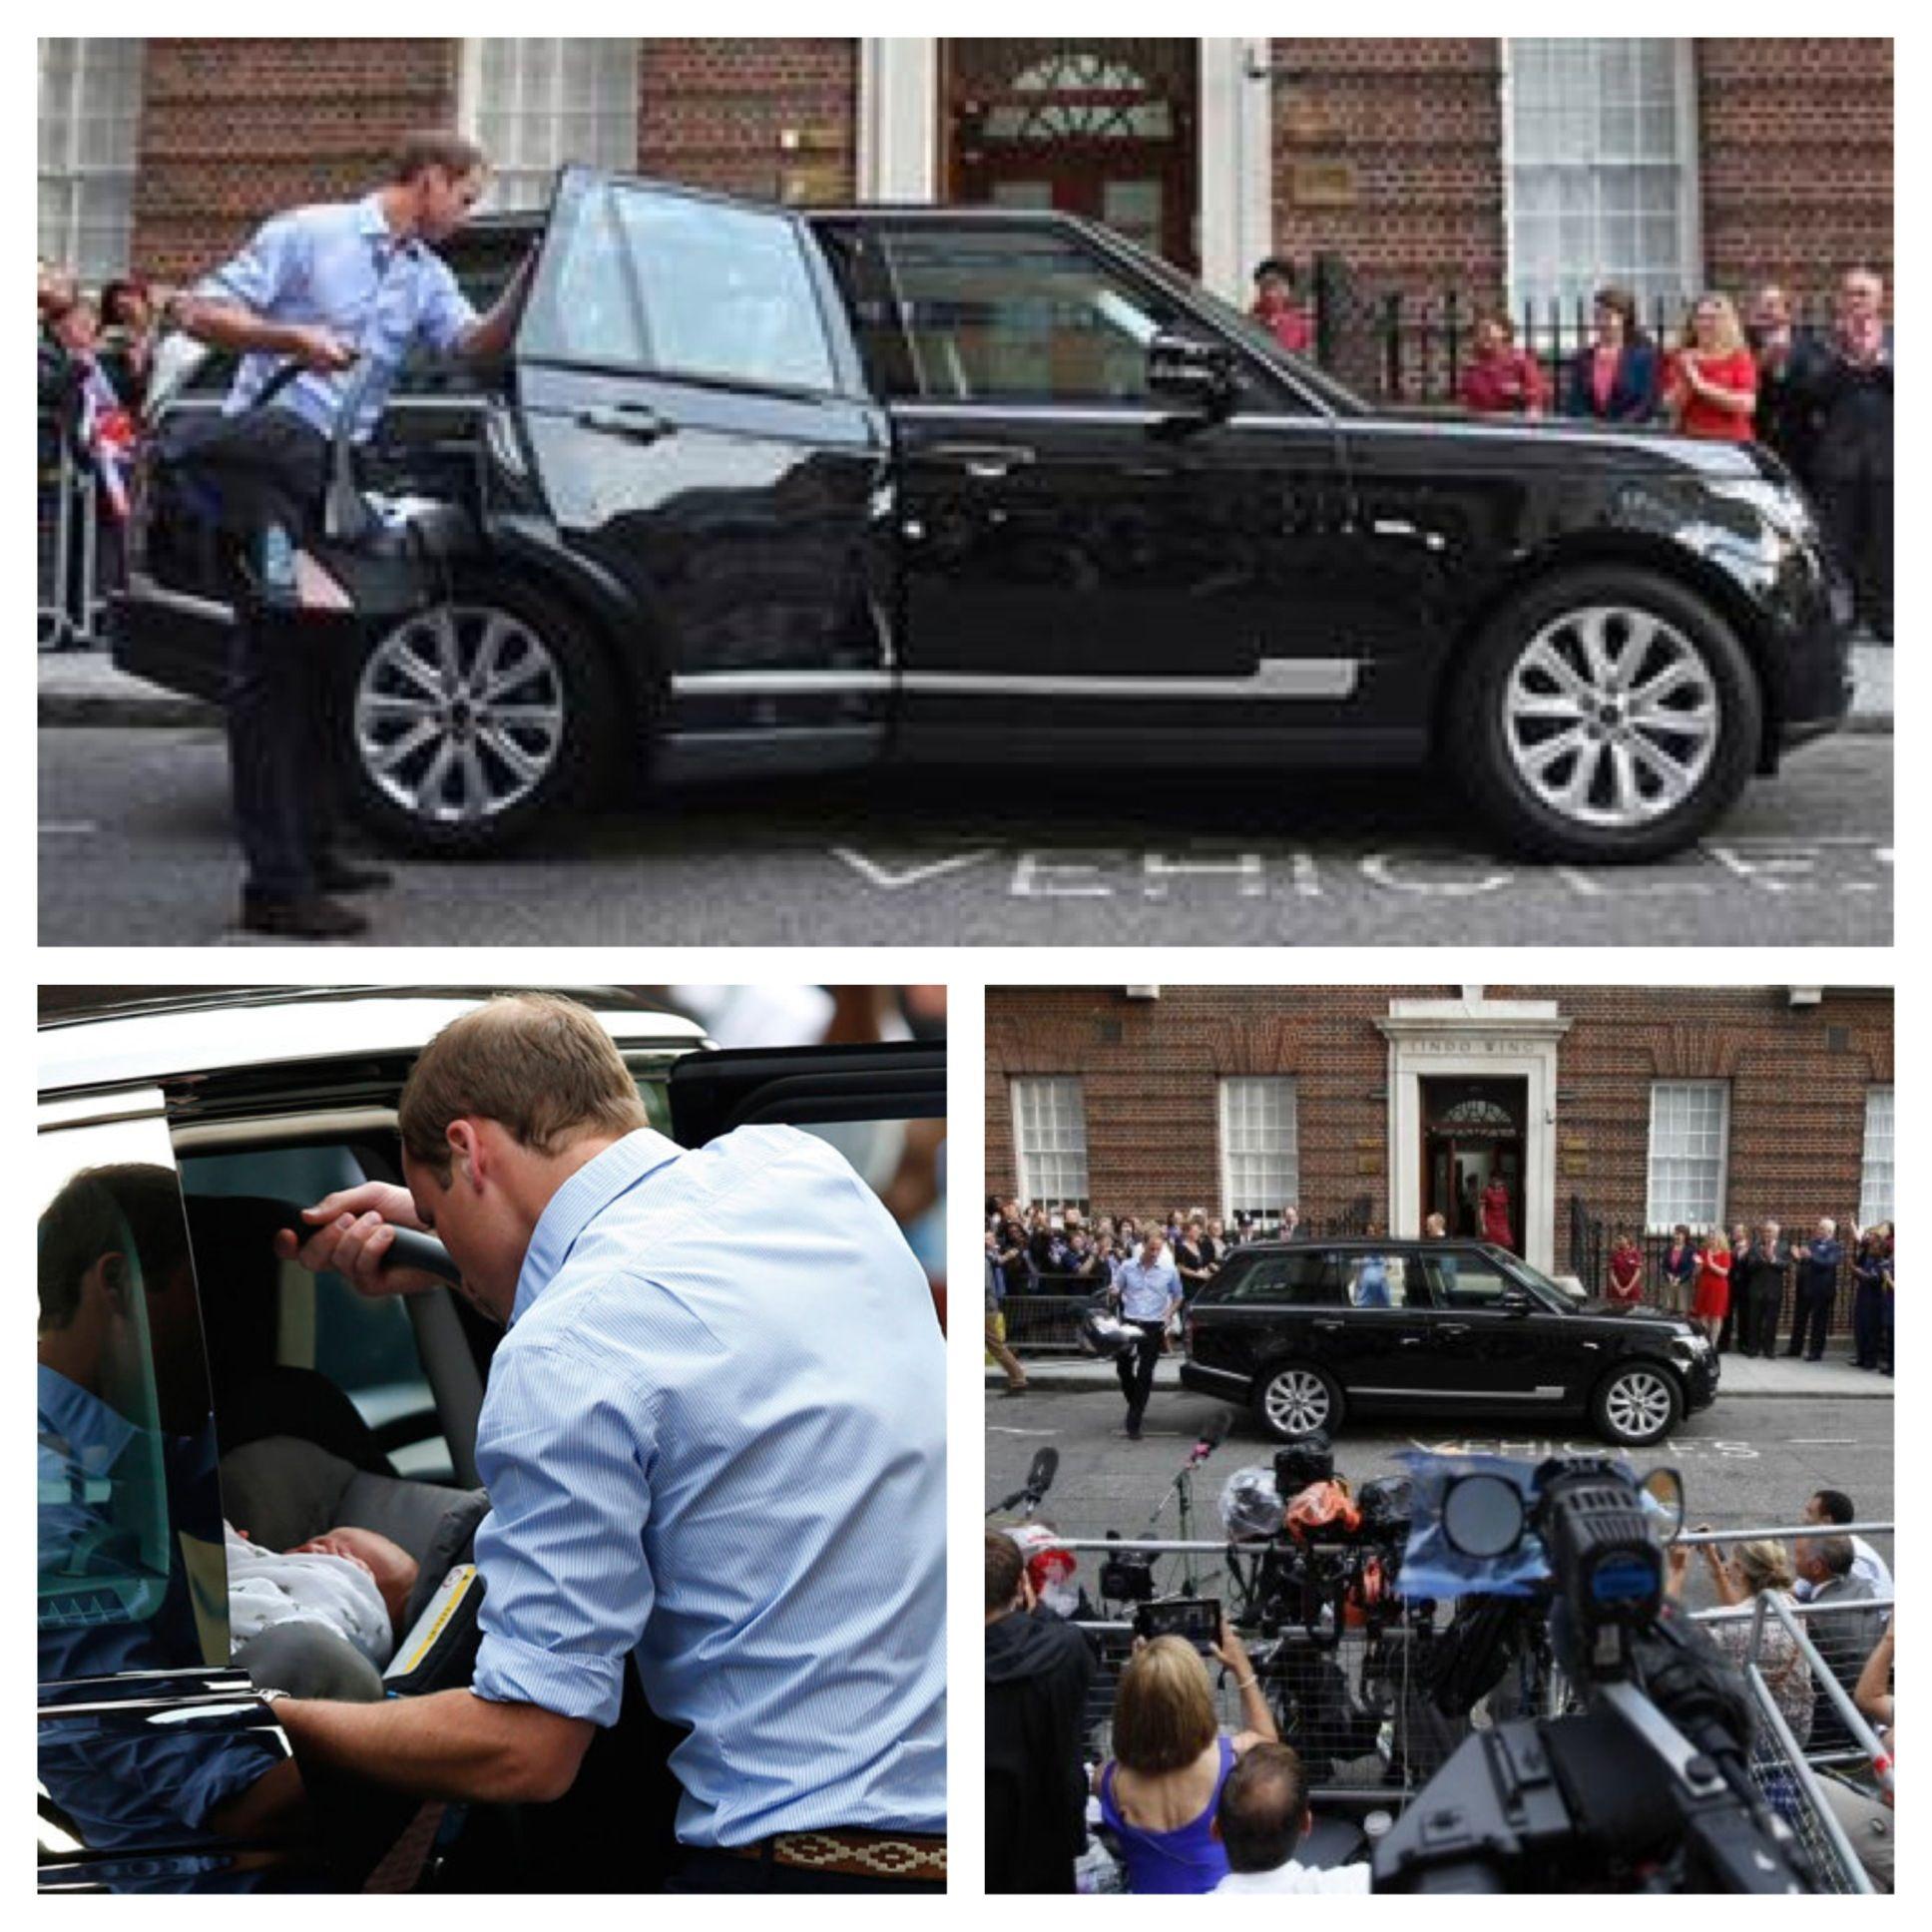 Range Rover...safe enough for The Royal